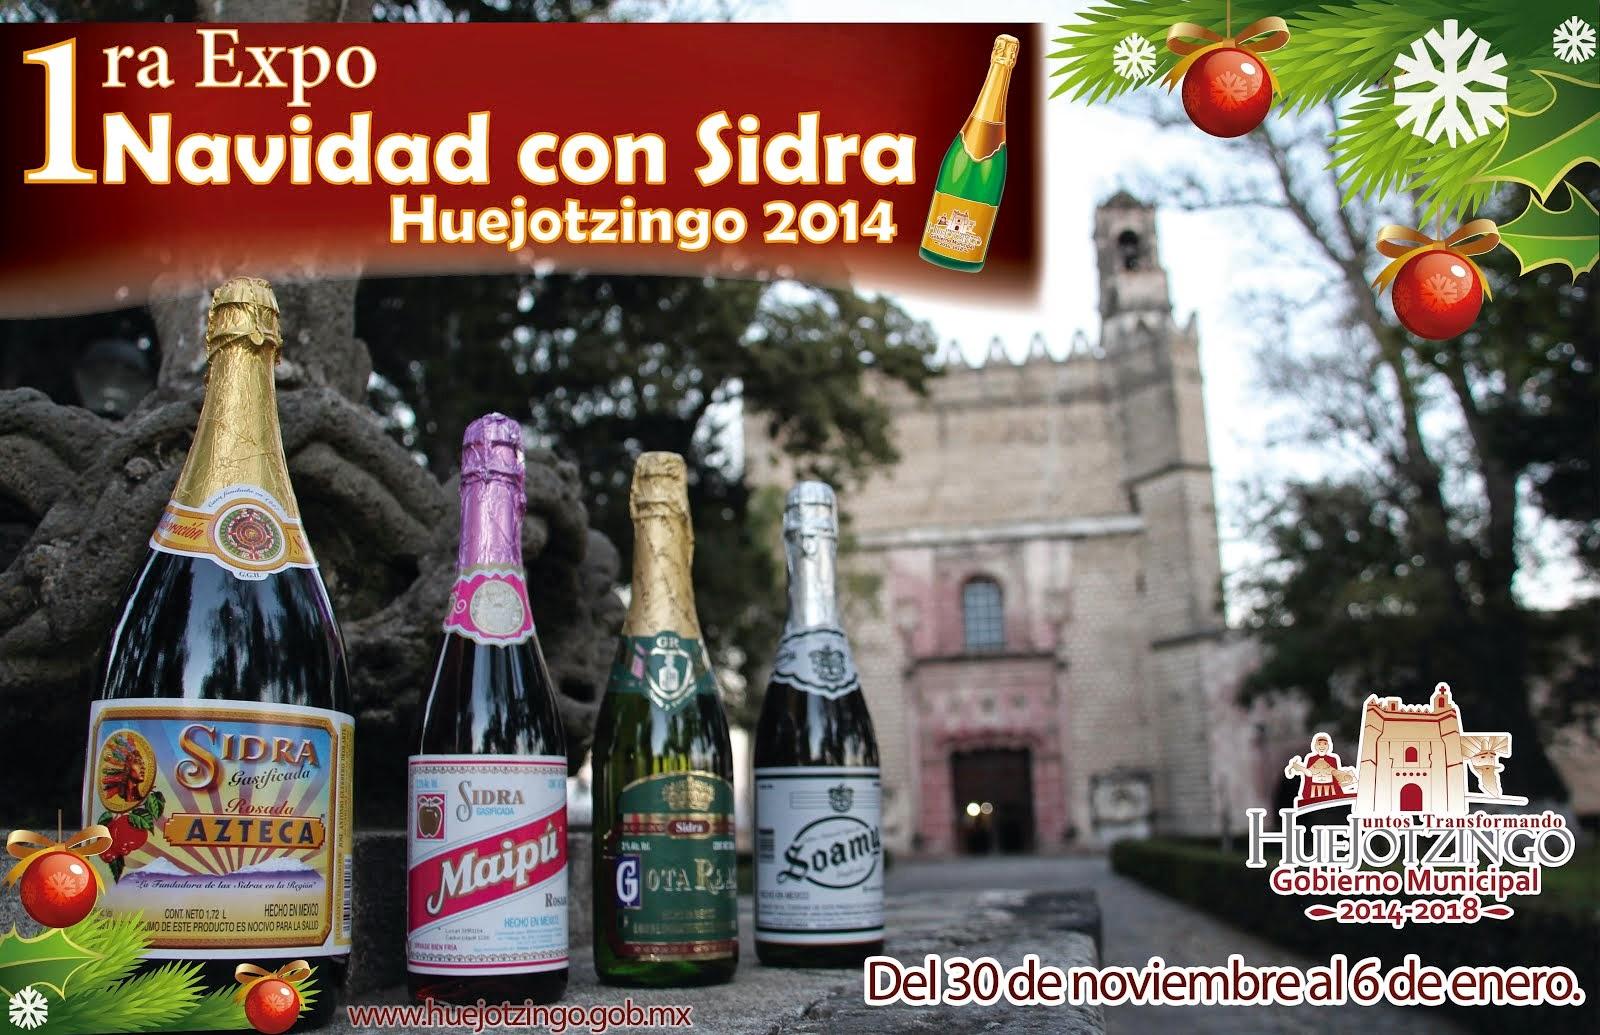 Expo Navidad Huejotzingo